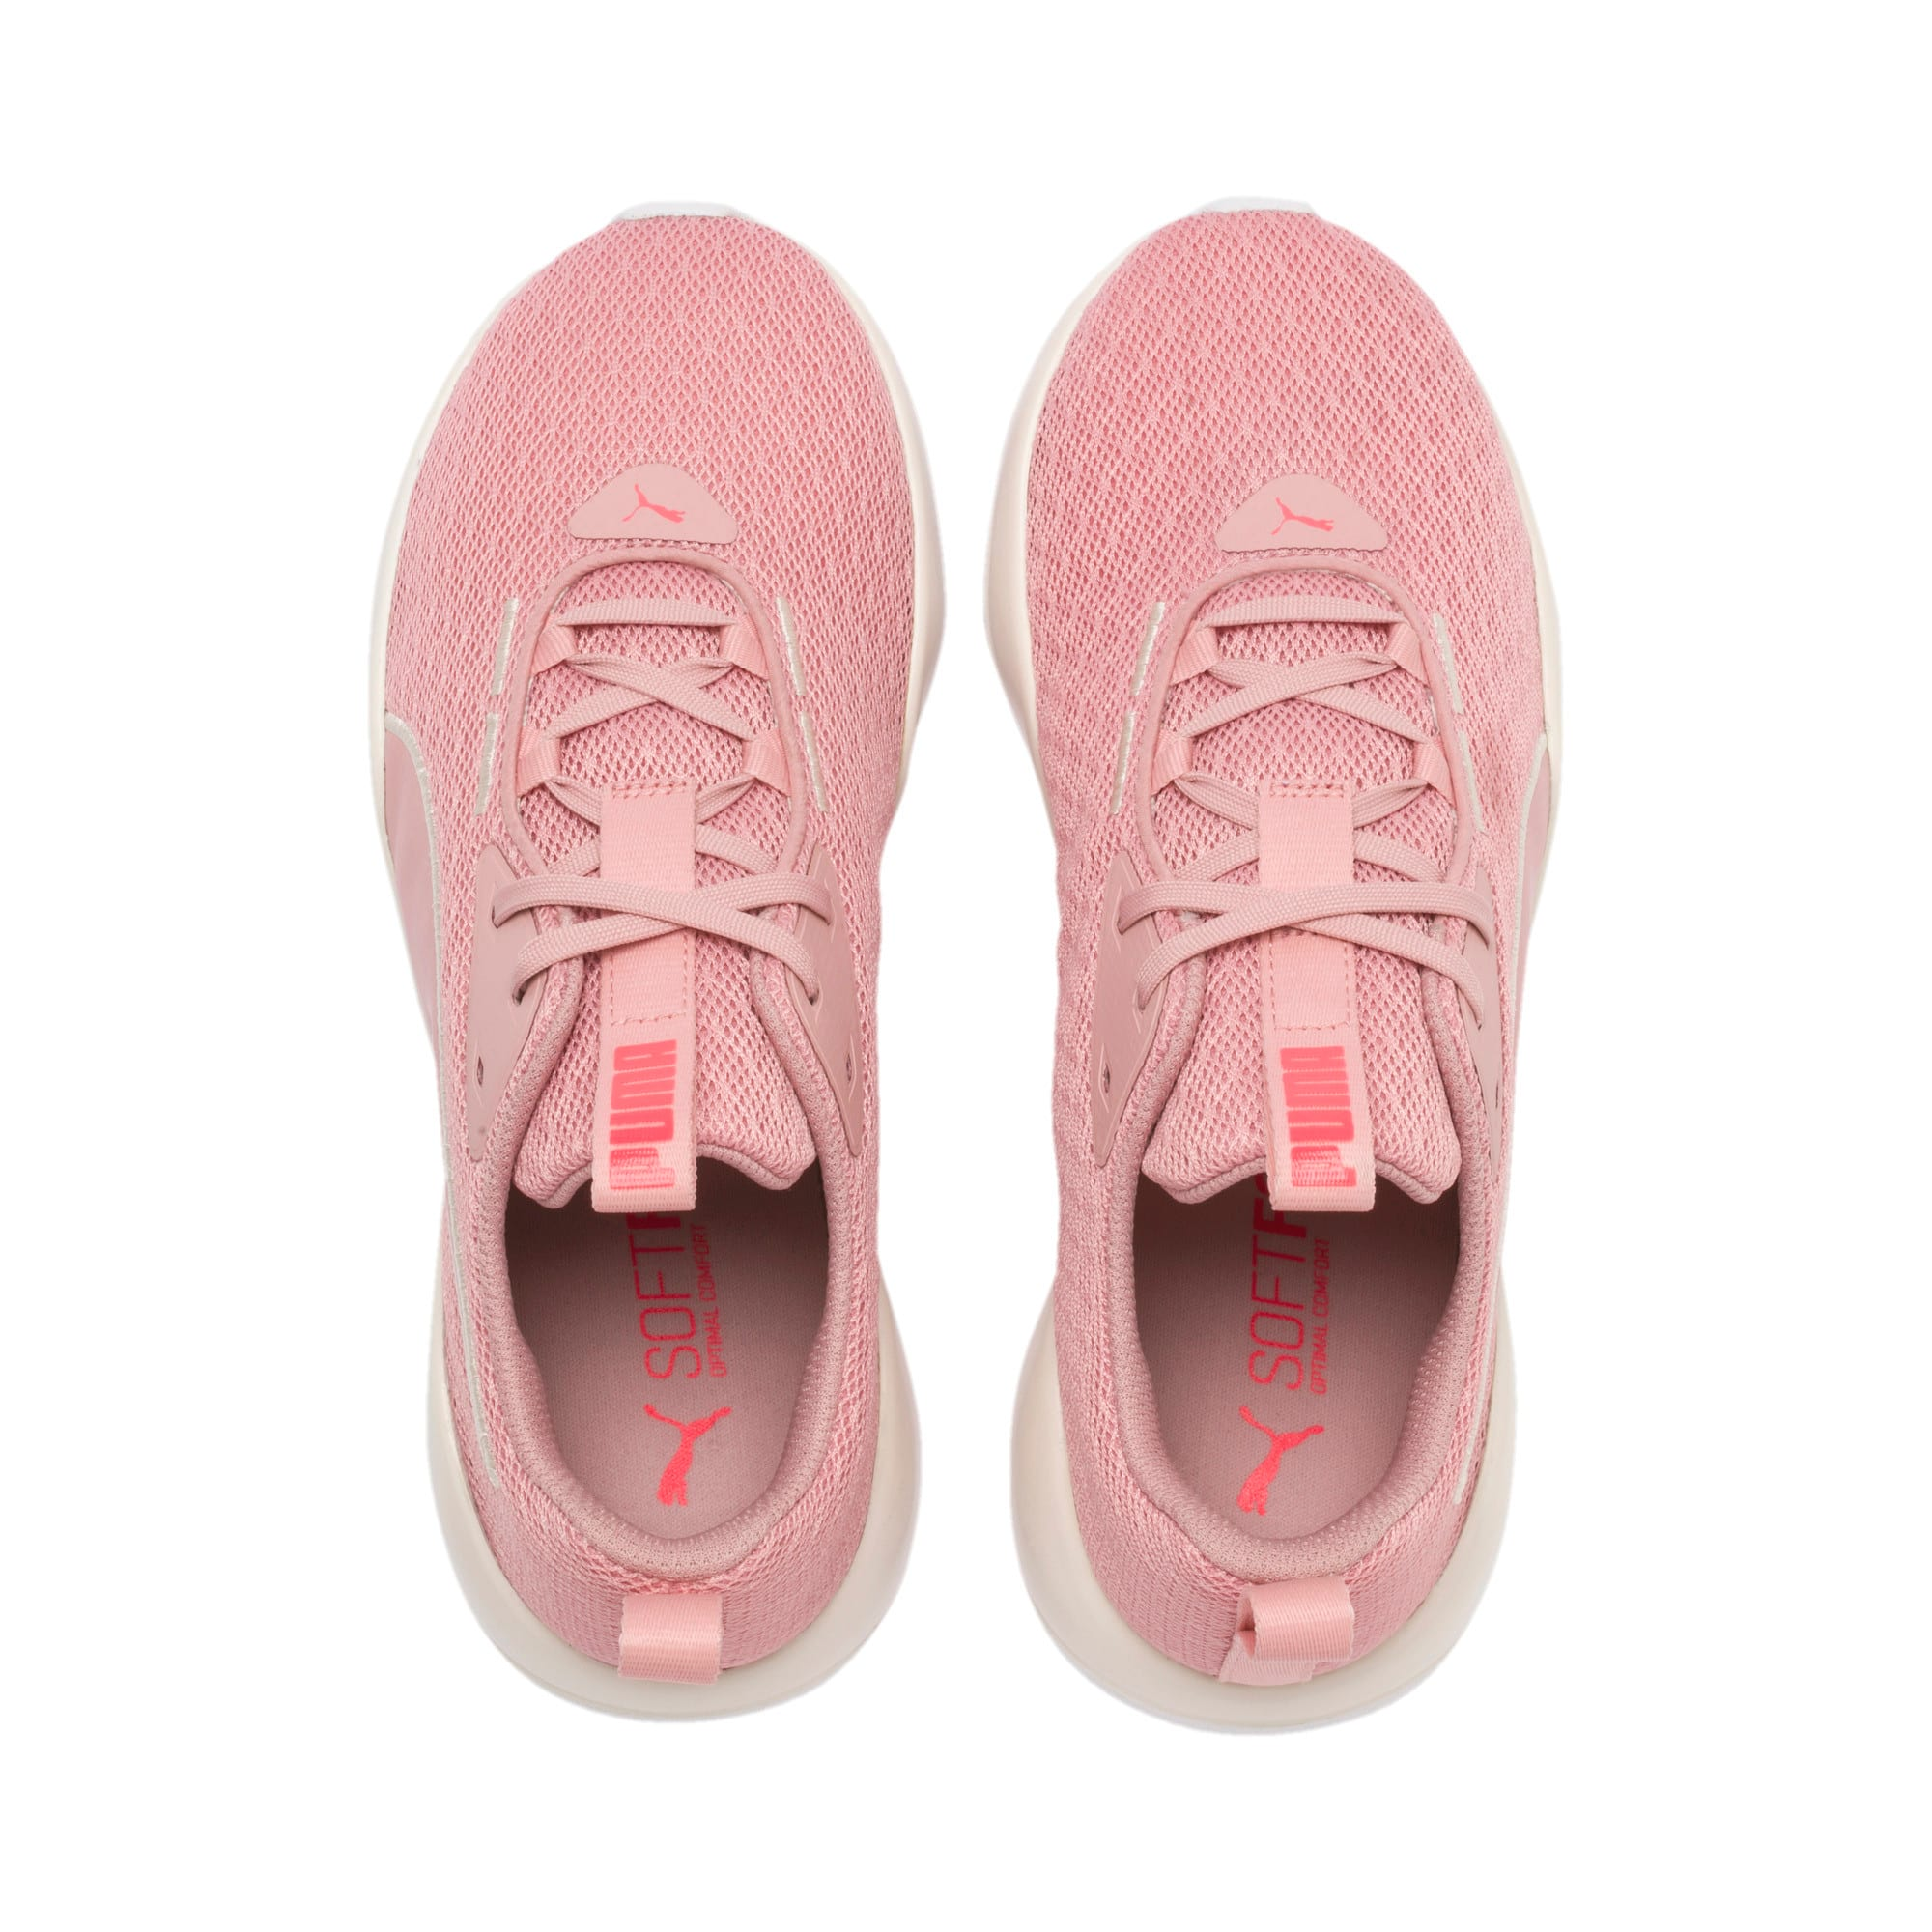 Thumbnail 4 of Flourish FS Women's Running Shoes, Bridal Rose-Puma White, medium-IND